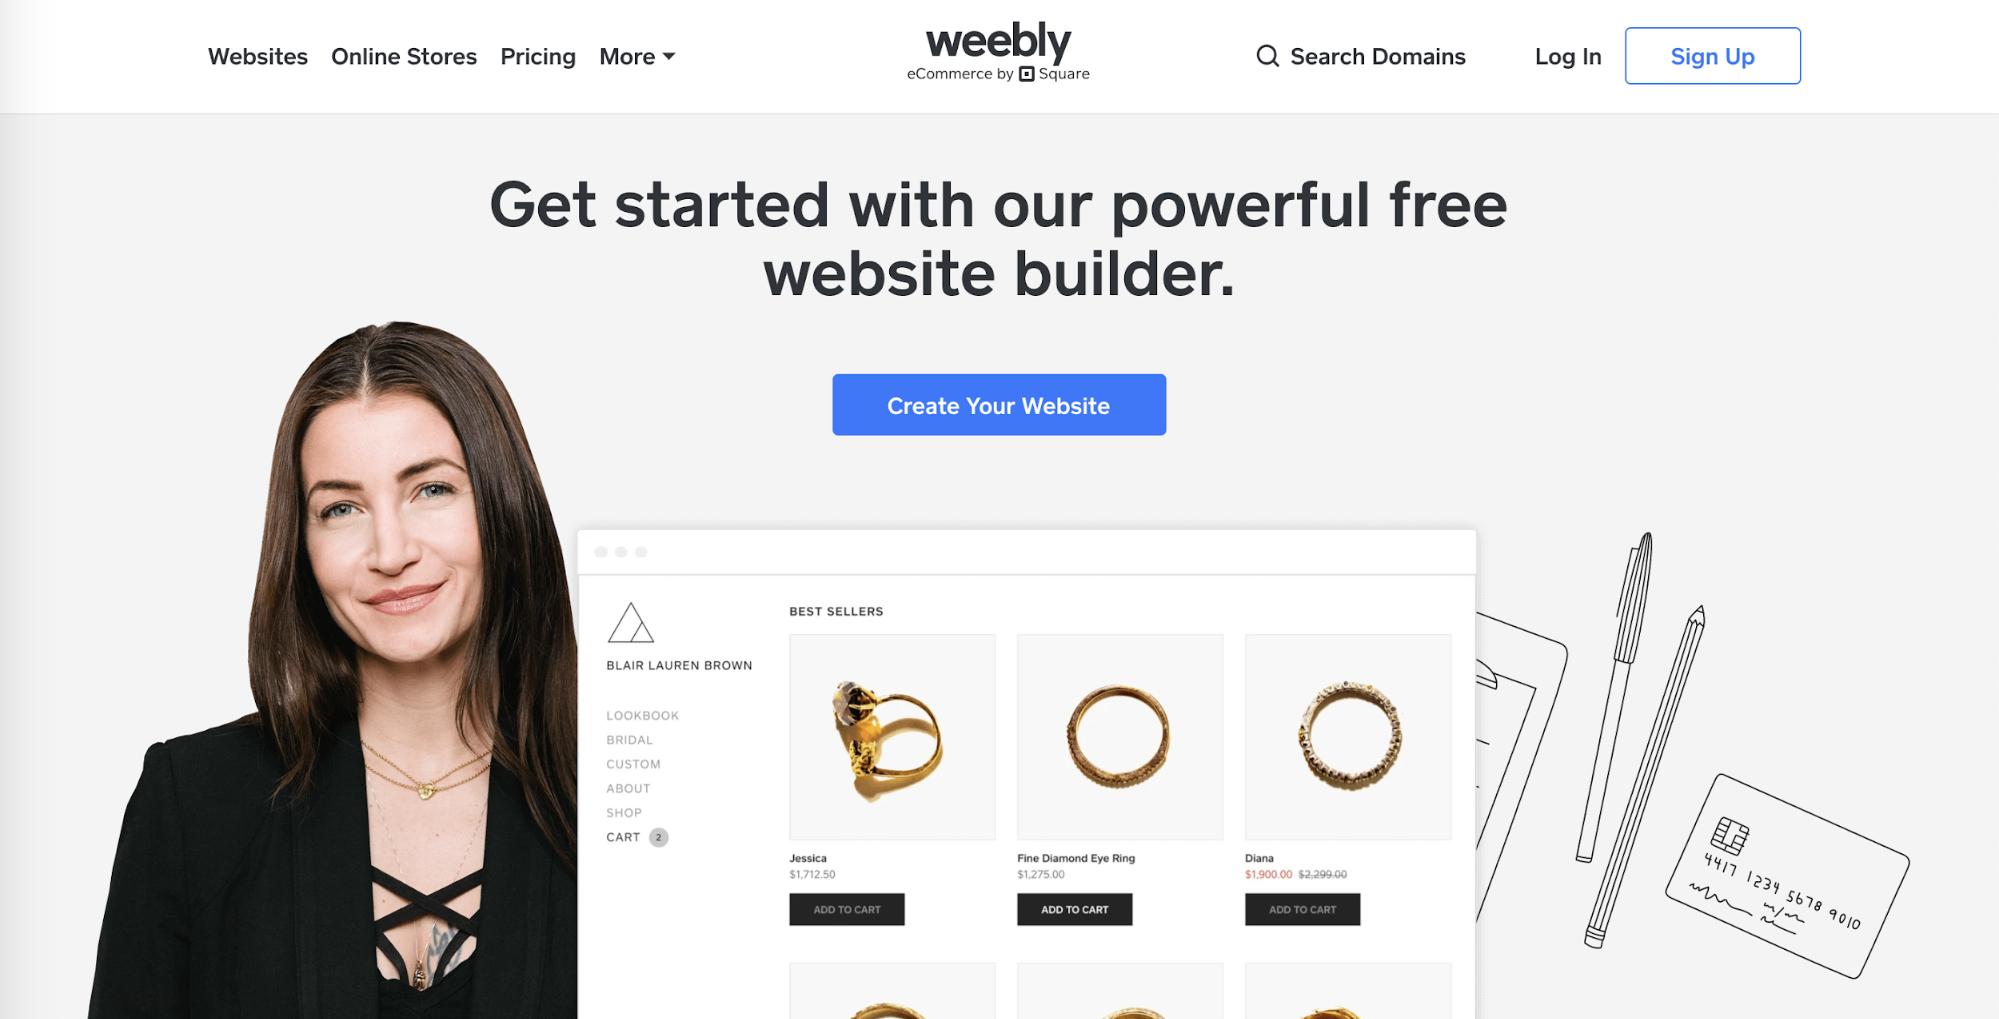 Weebly website builder landing page